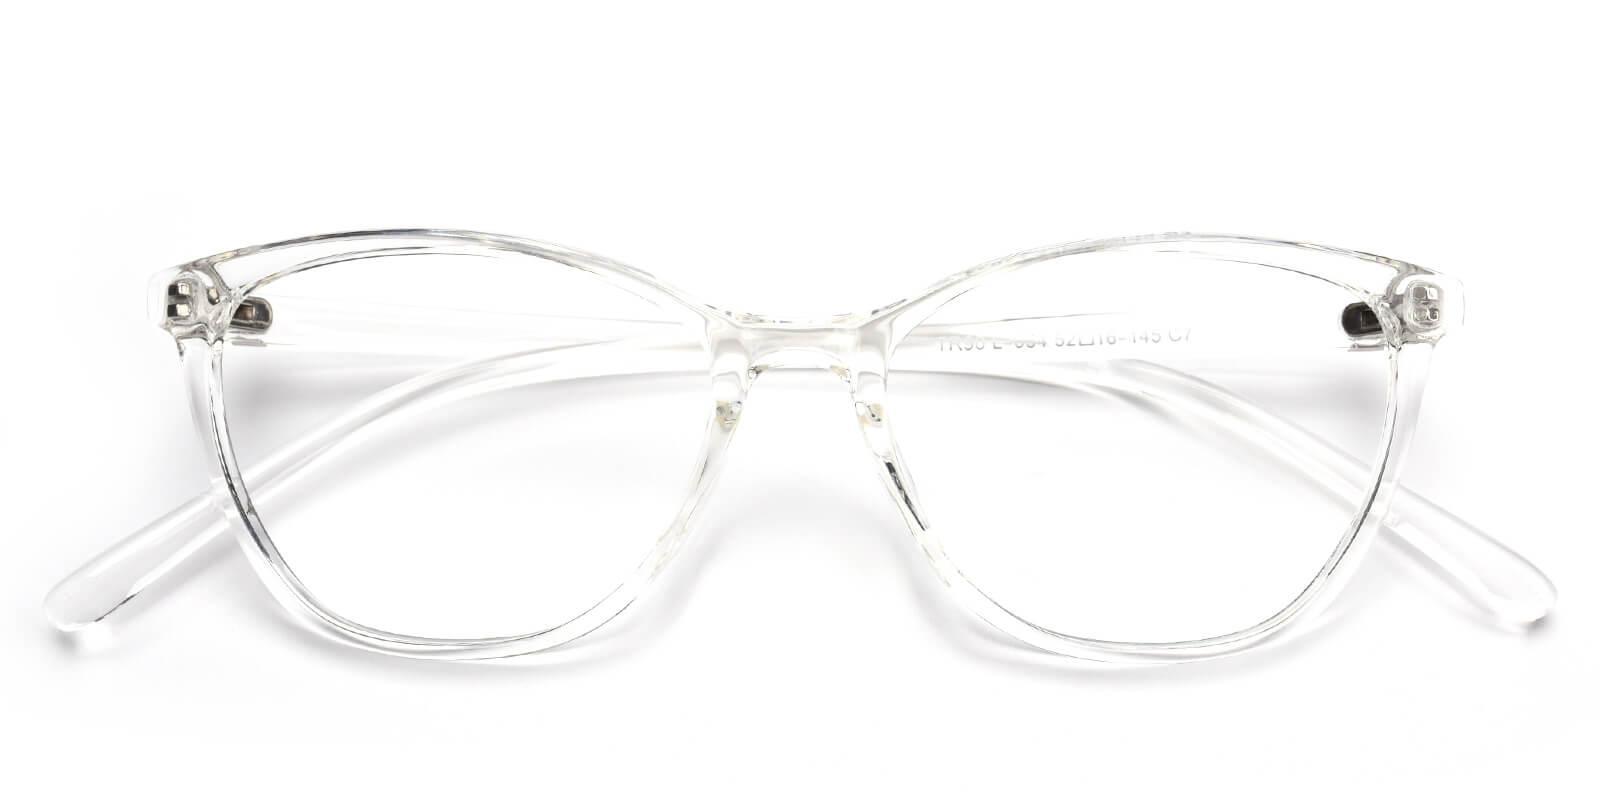 Kish-Translucent-Cat-TR-Eyeglasses-detail